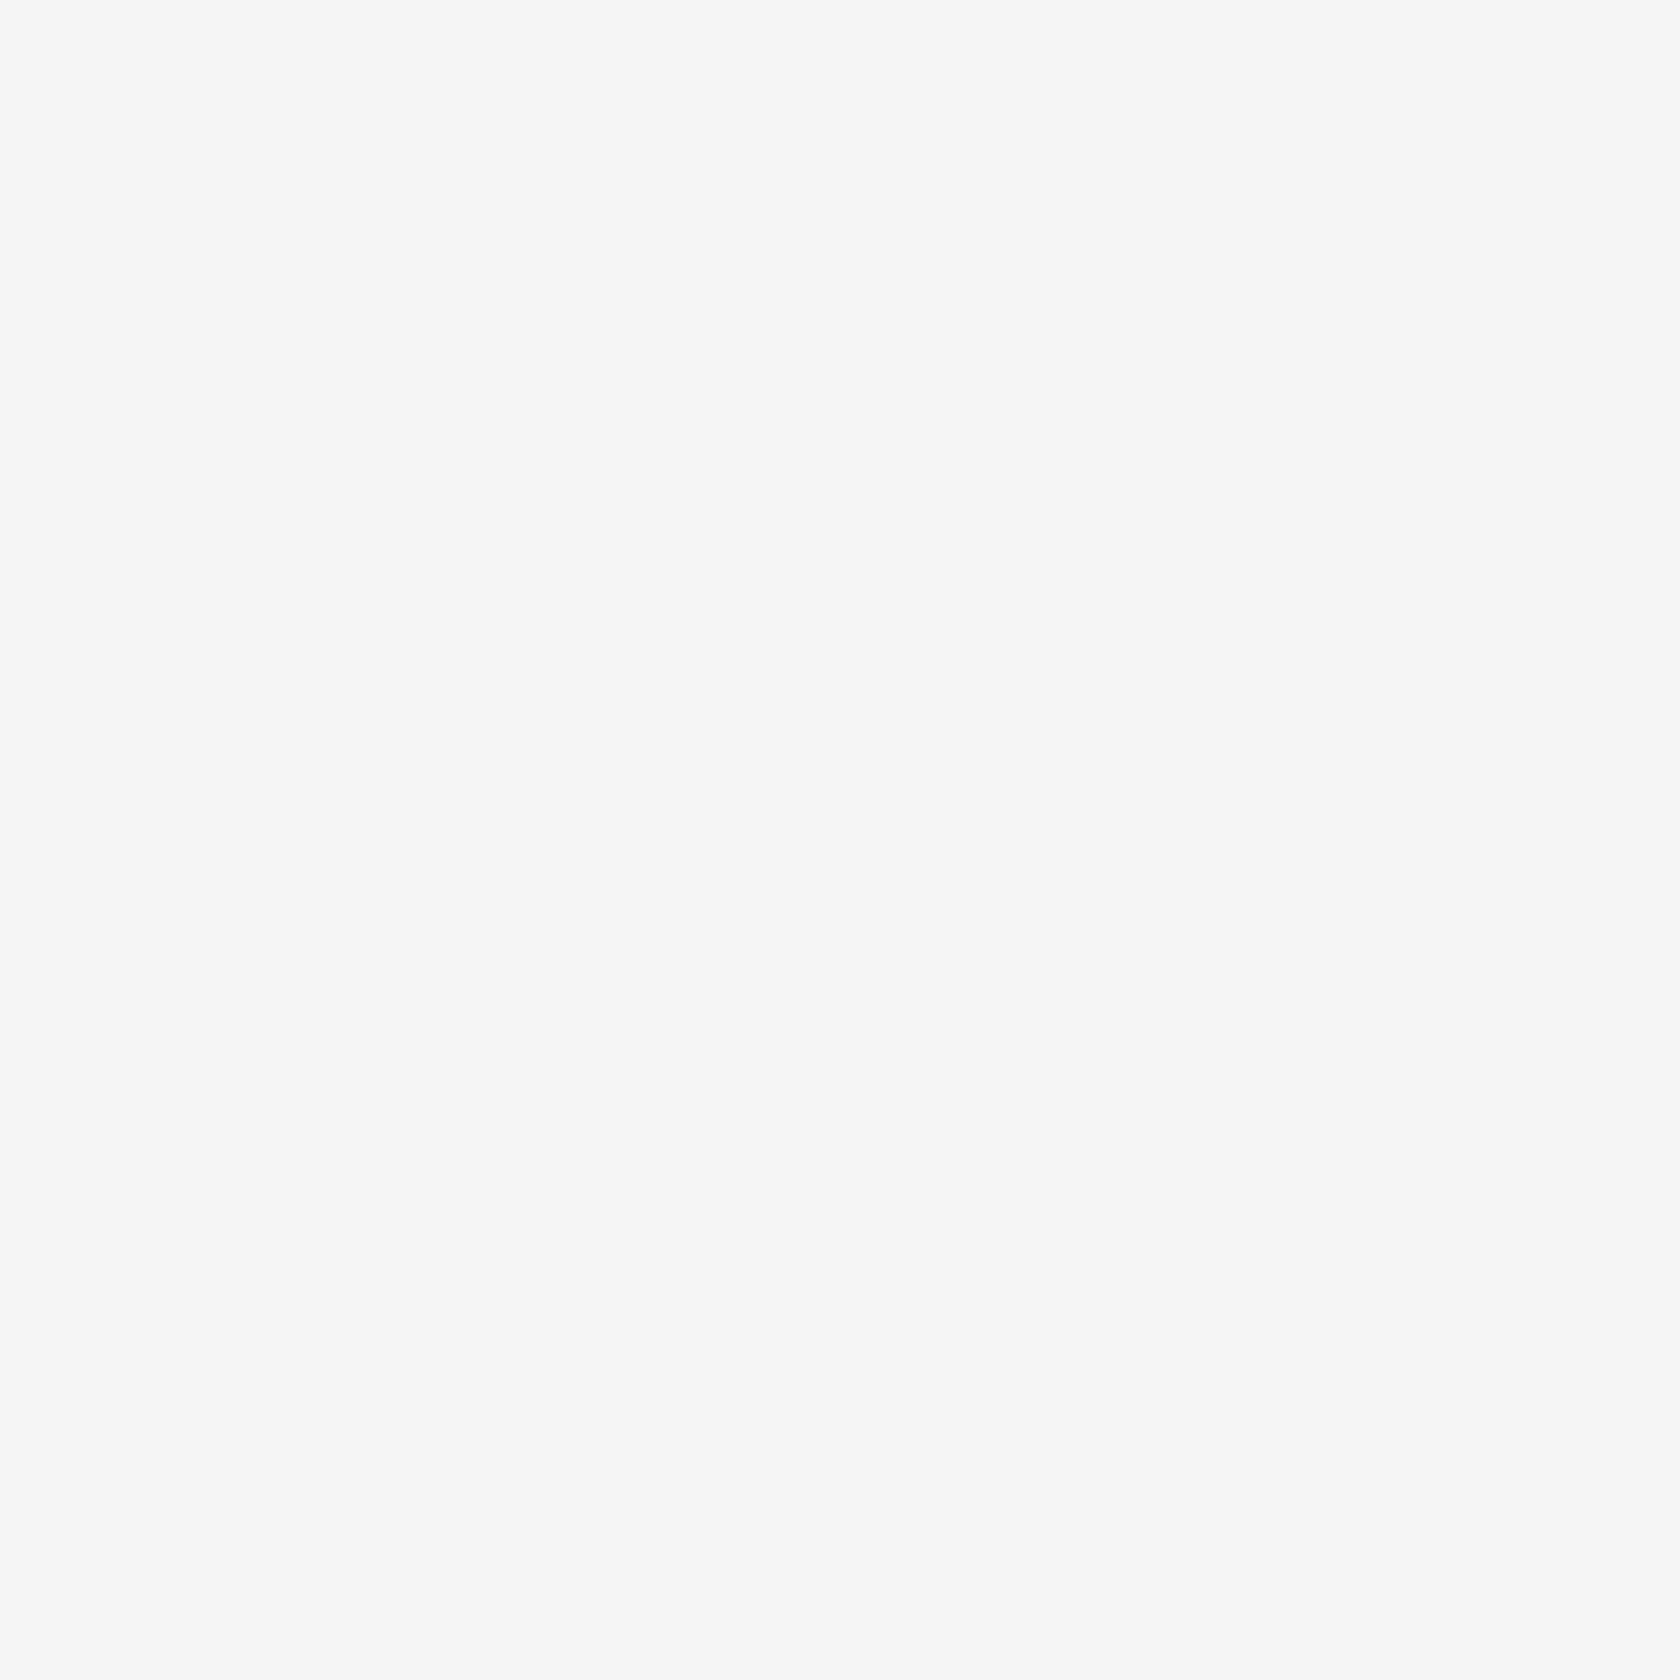 sc 1 st  Hermes & Carnets d\u0027Equateur American dinner plate | Hermès